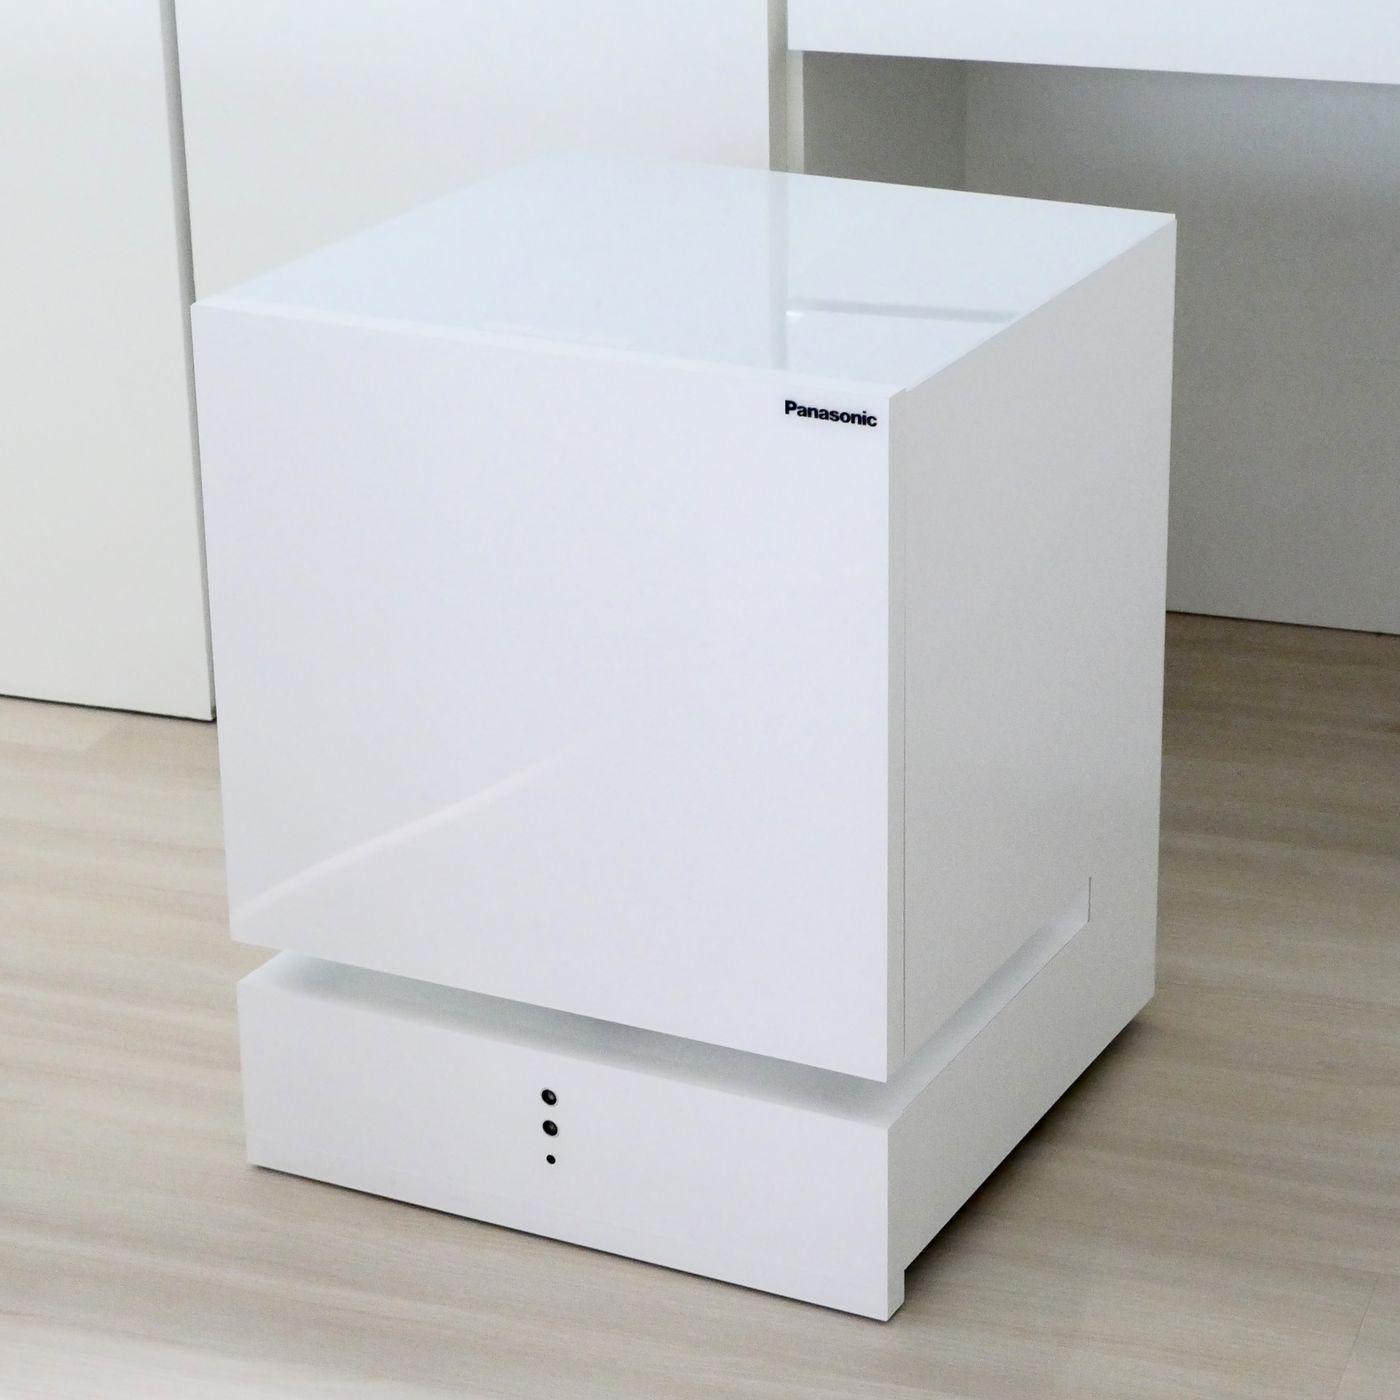 Panasonic unveils futuristic smart home appliances - Curbed